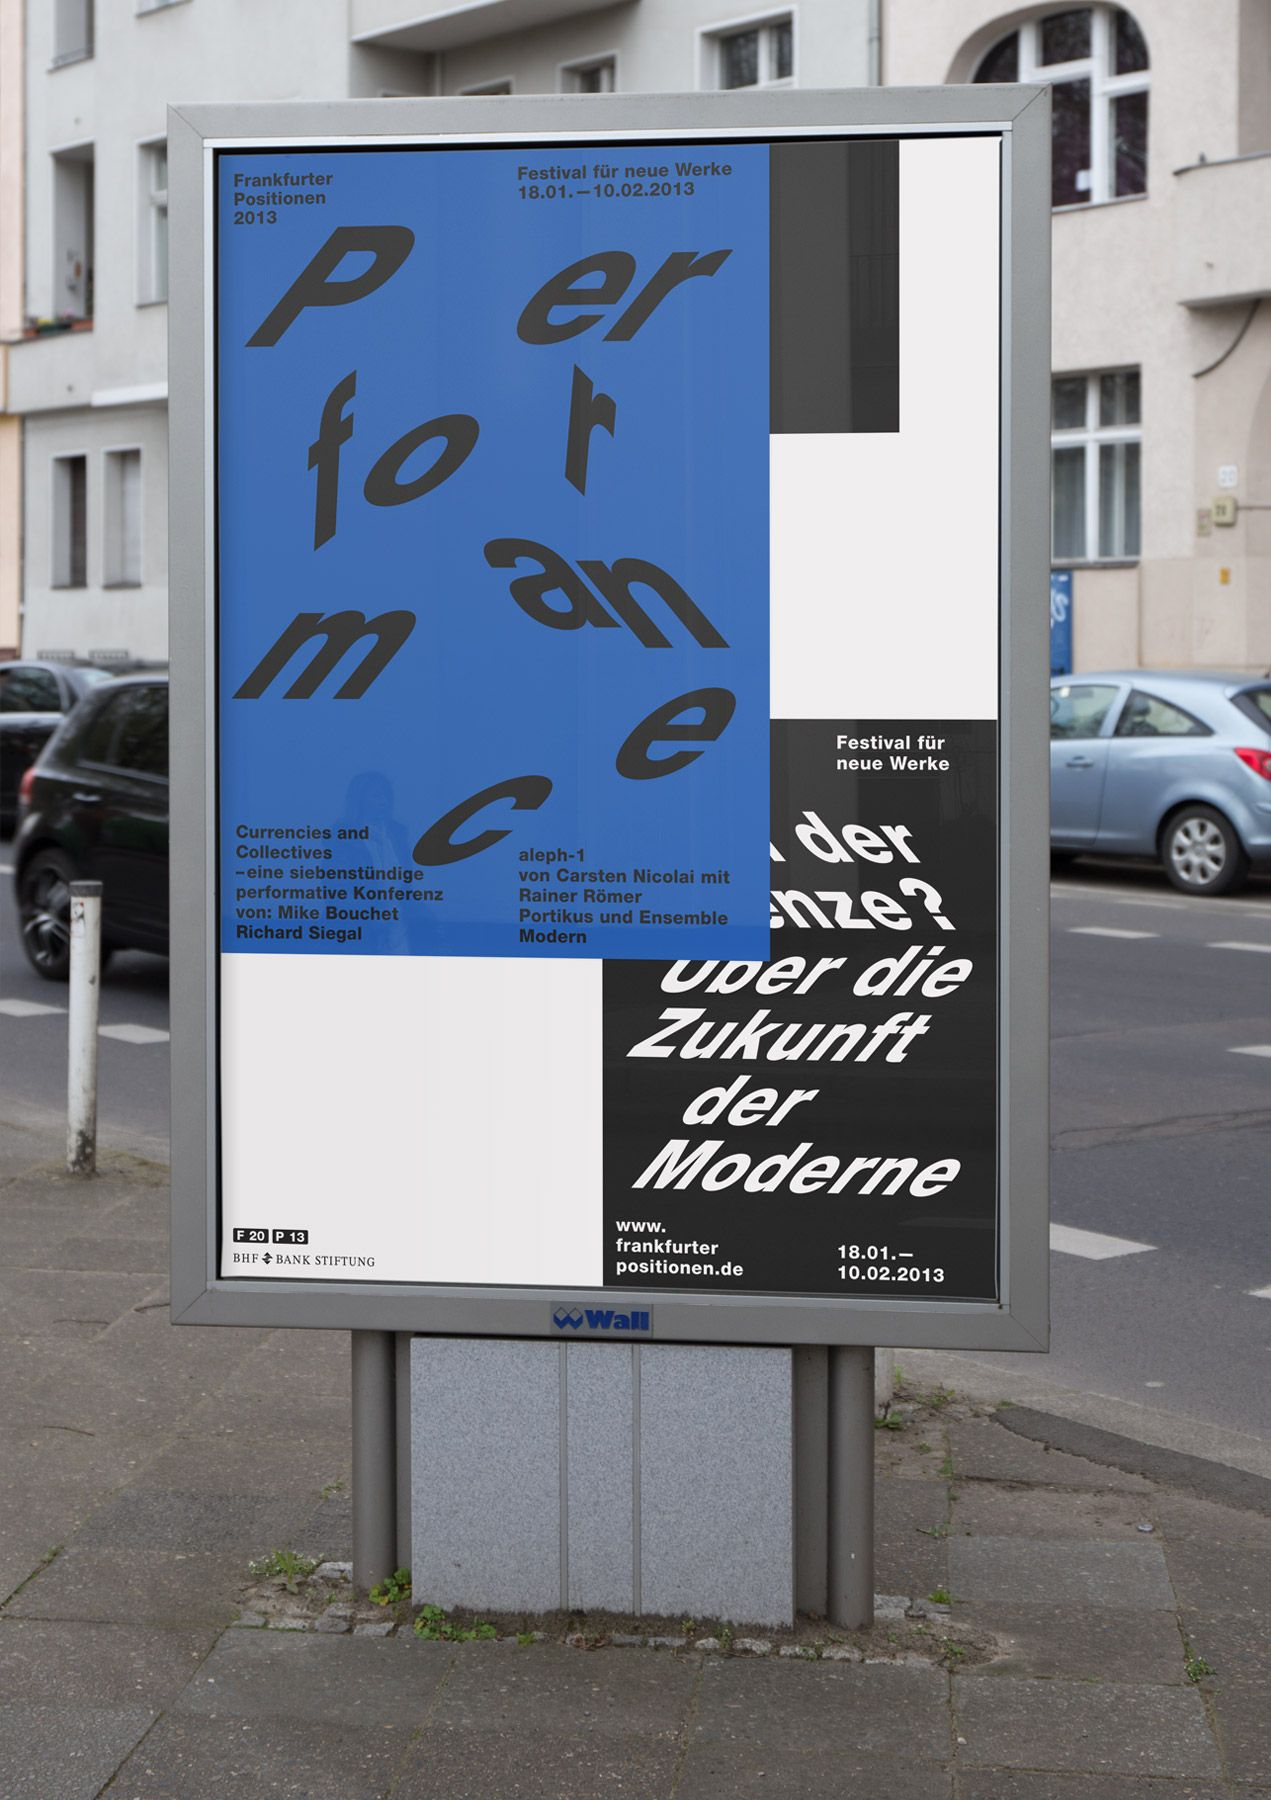 Lebenliebegrafik Design By Hort Berlin Design Graphic Artist Designer Graphic Poster